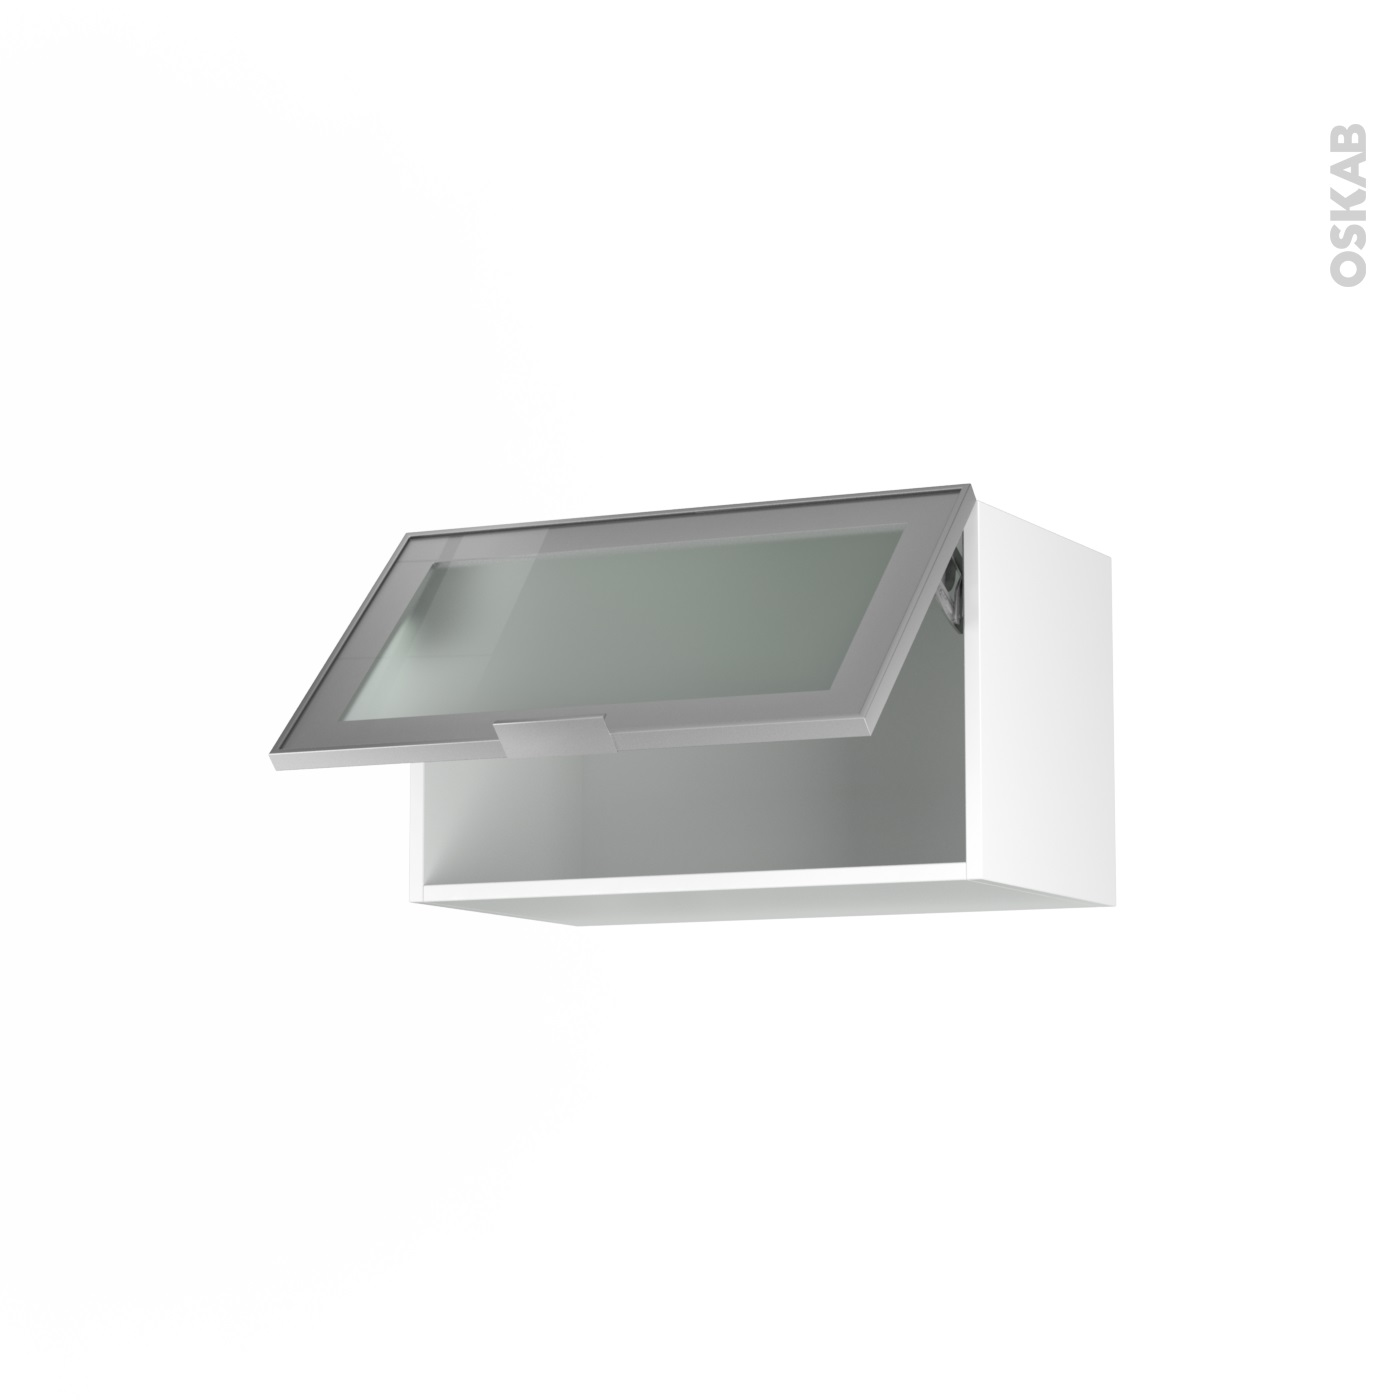 Meuble de cuisine Haut abattant vitré Façade alu, 10 porte, L10 x H10 x P10  cm, SOKLEO